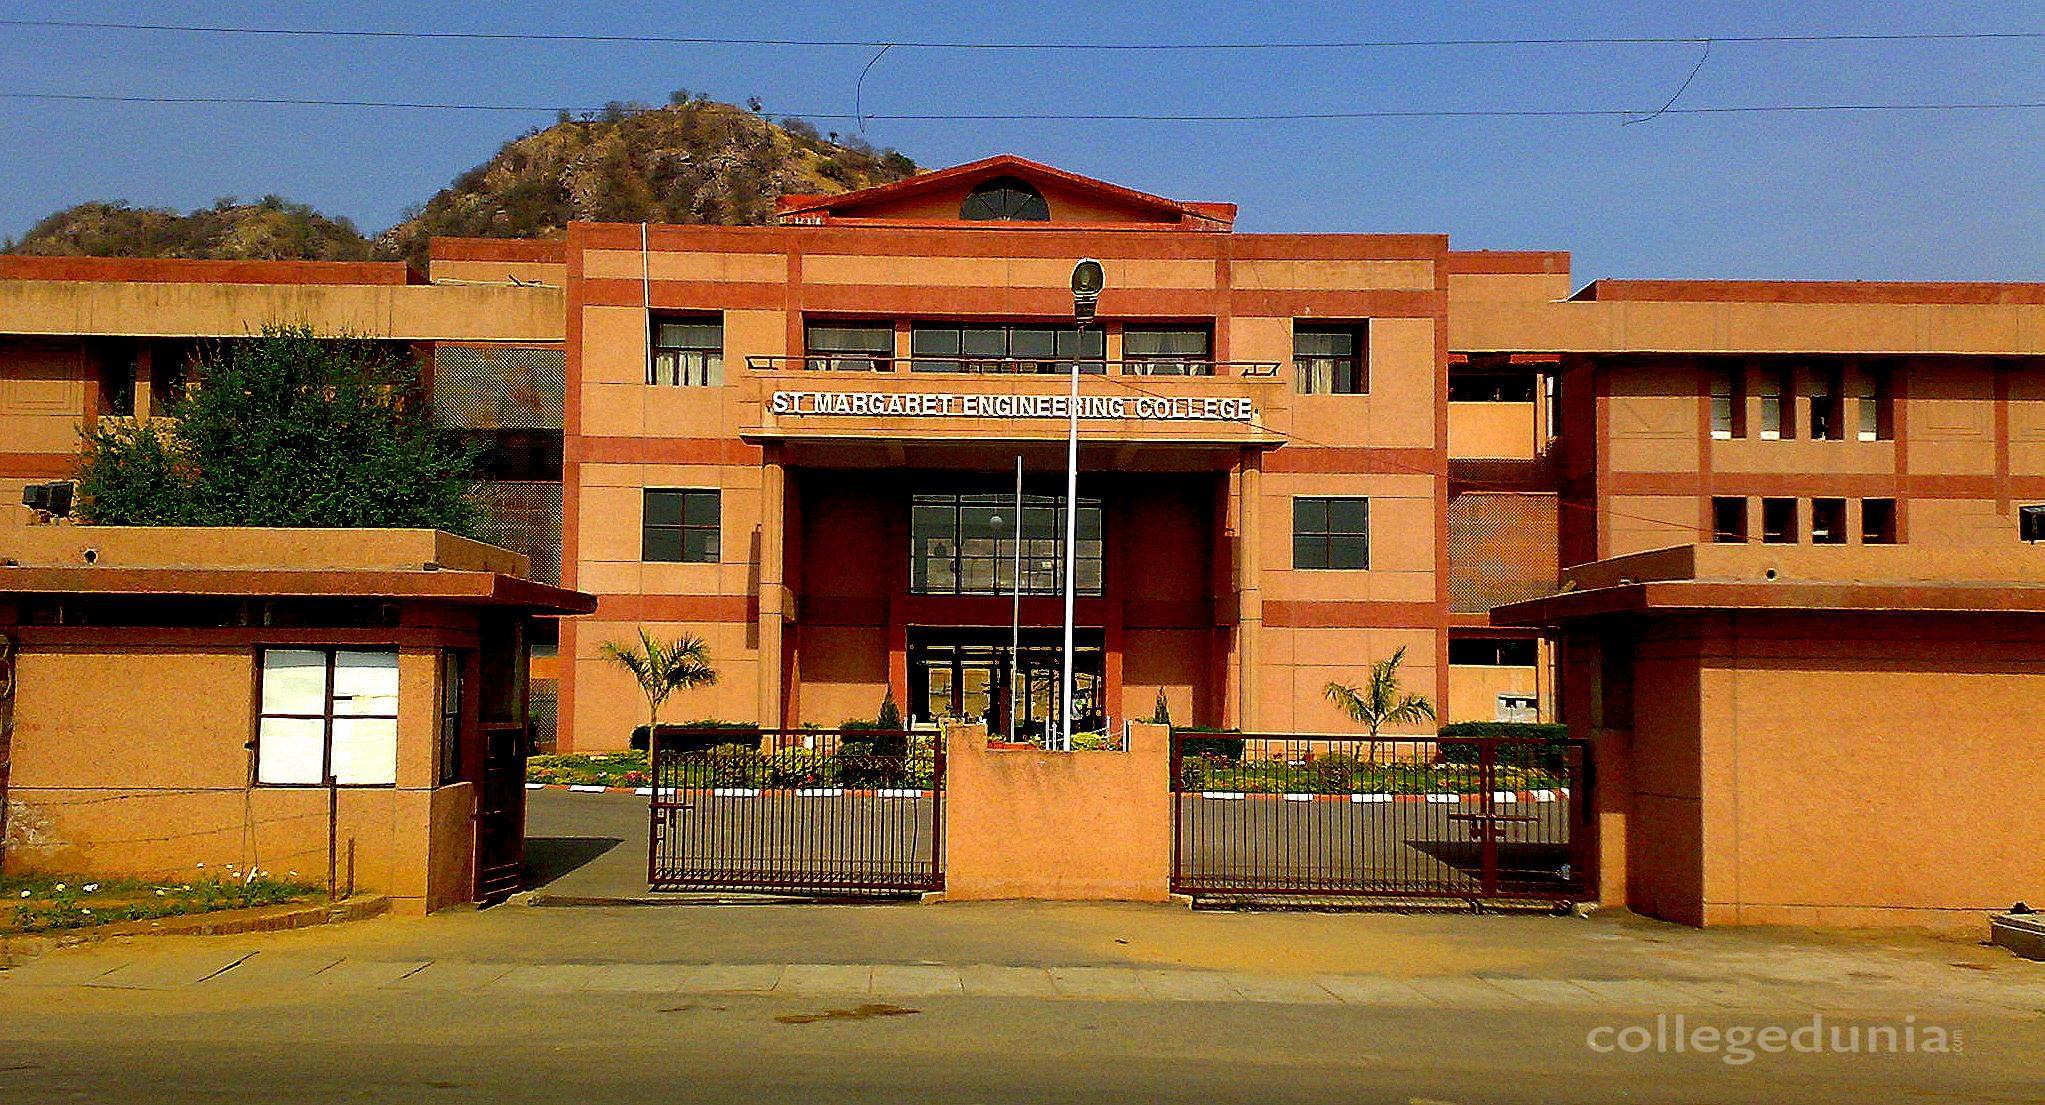 St Margaret Engineering College